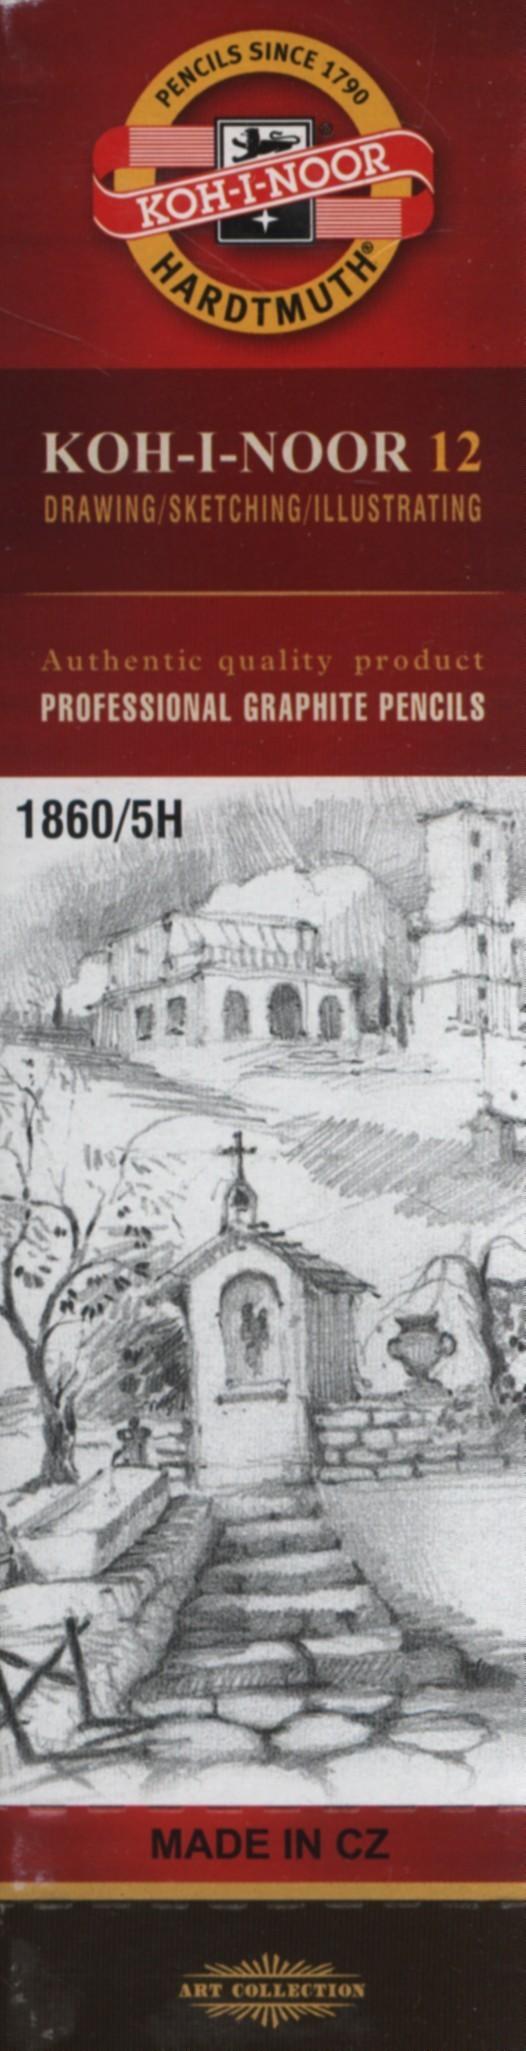 Koh-I-Noor Koh-I-Noor Ołówek grafitowy 1860/5H 12 szt